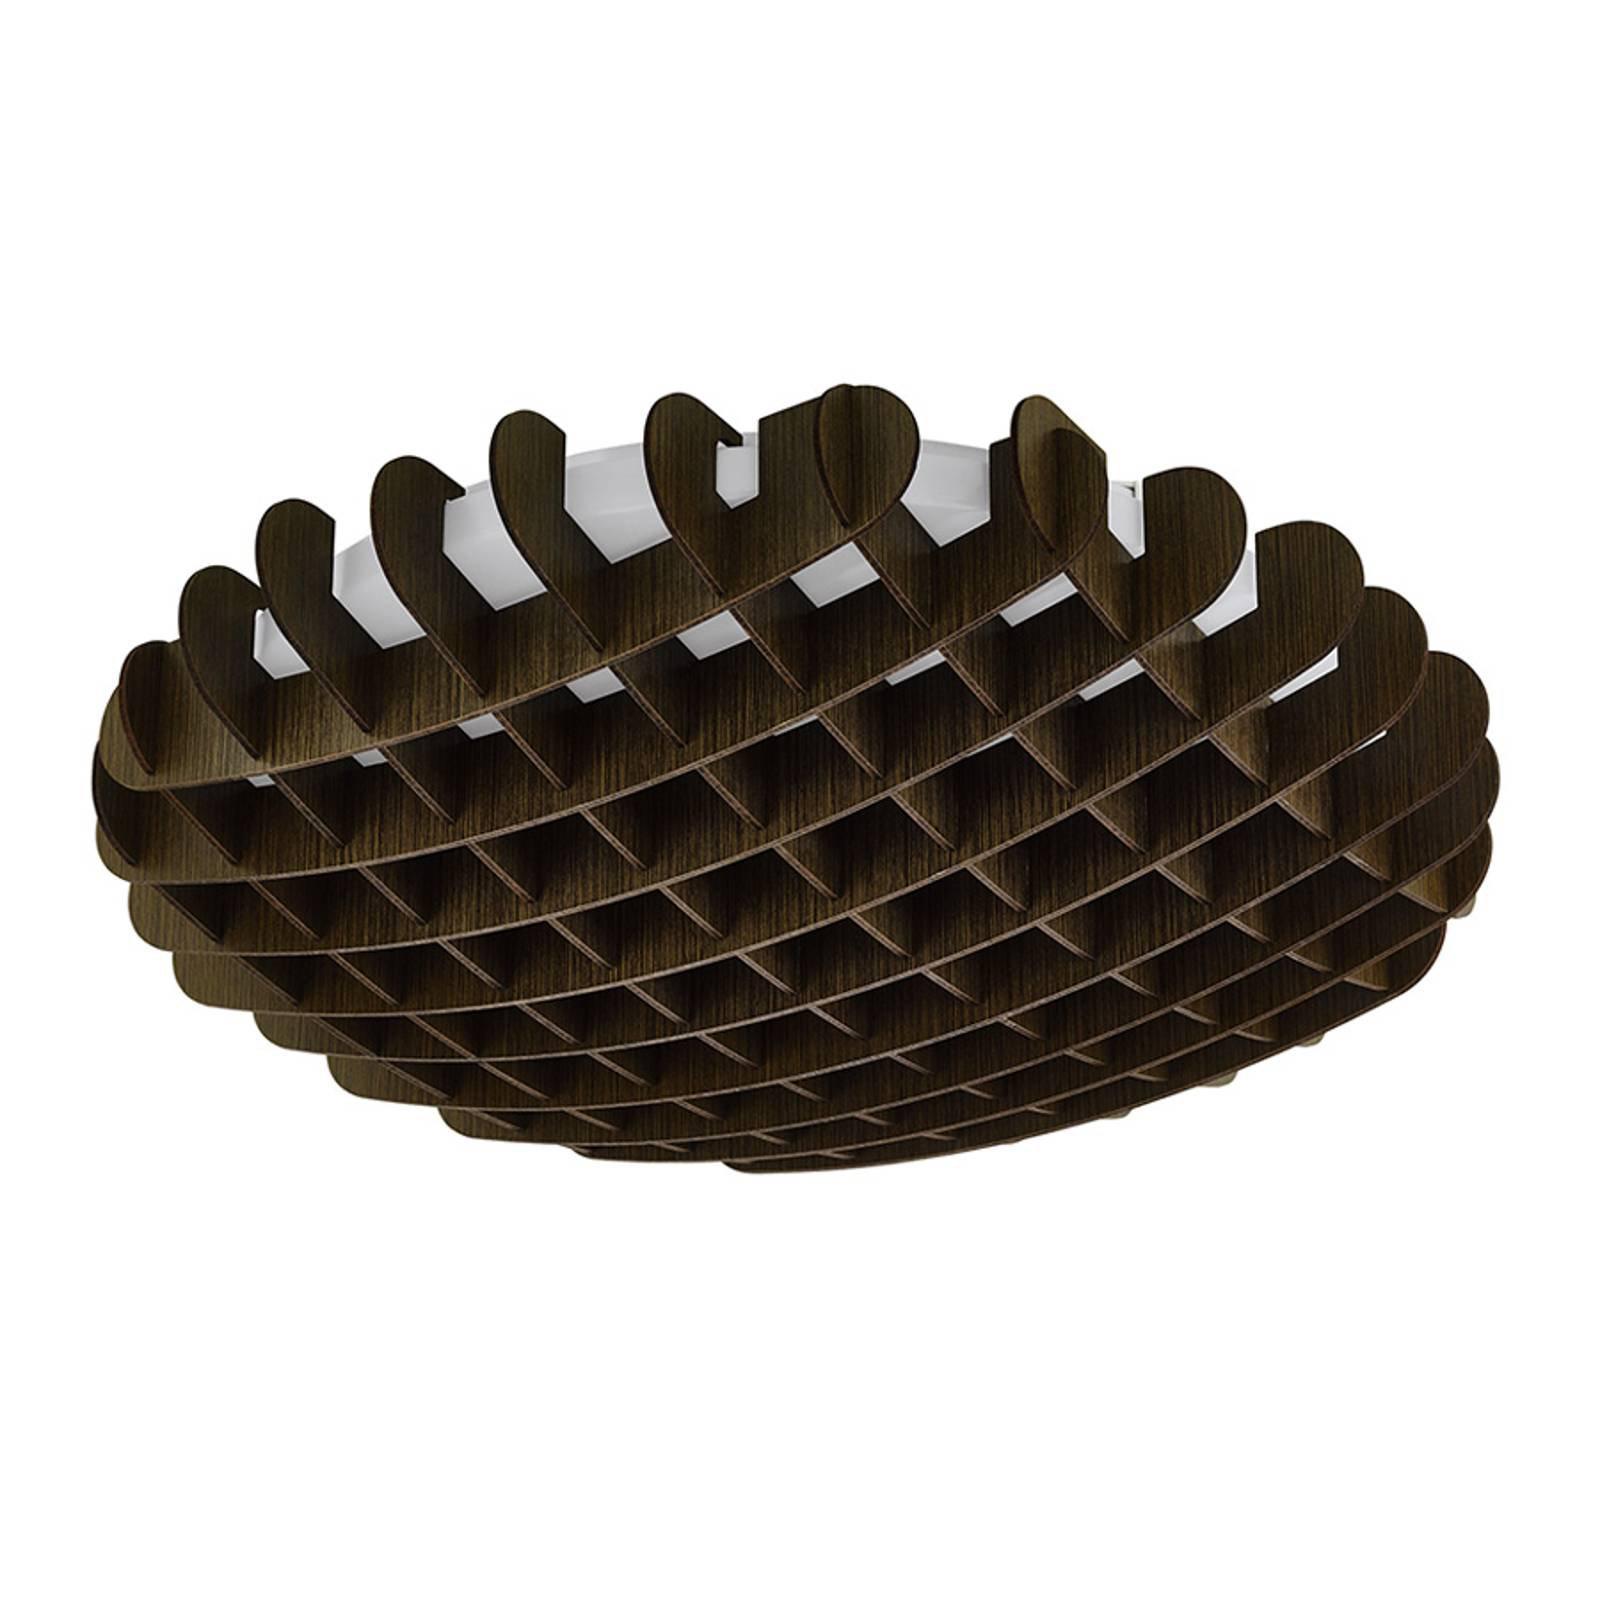 LED-taklampe Valdecabras, brun